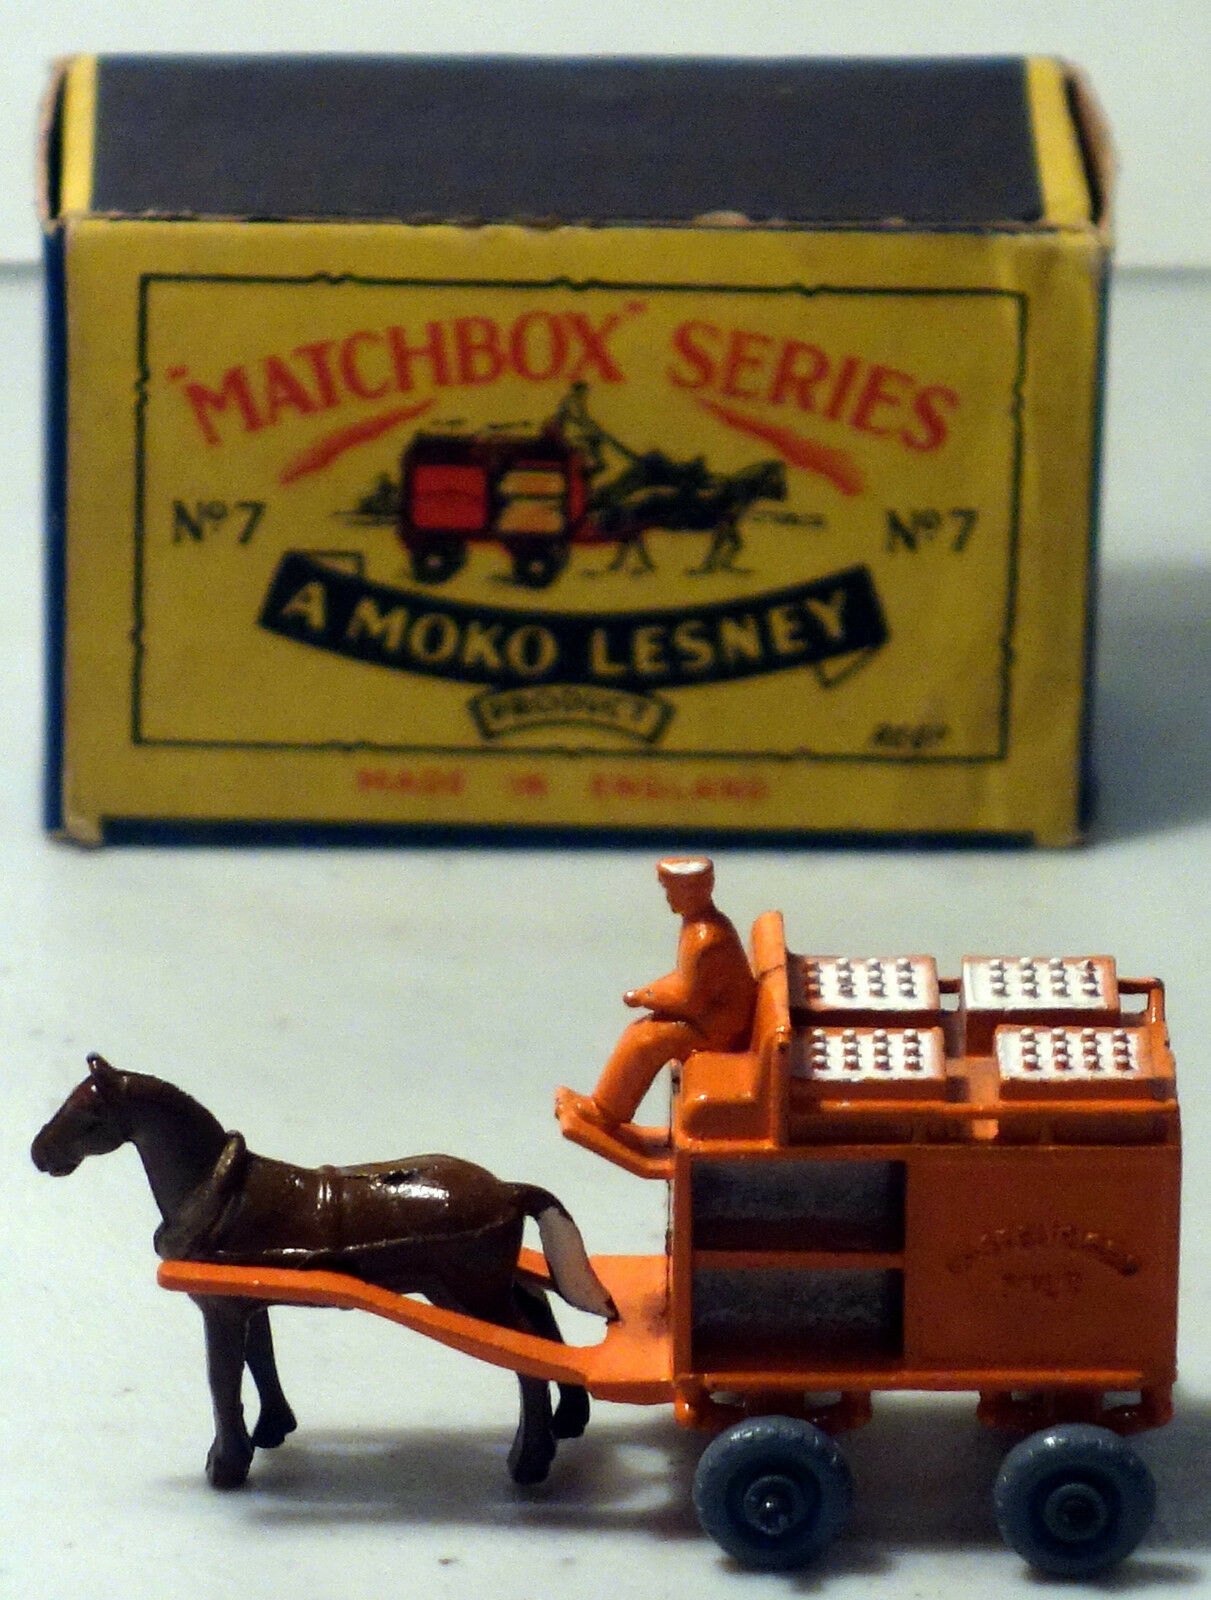 DTE MOKO LESNEY MATCHBOX MATCHBOX MATCHBOX REGULAR WHEELS 7-1 LT ORG HORSE DRAWN MILK FLOAT GPW b4ecd9